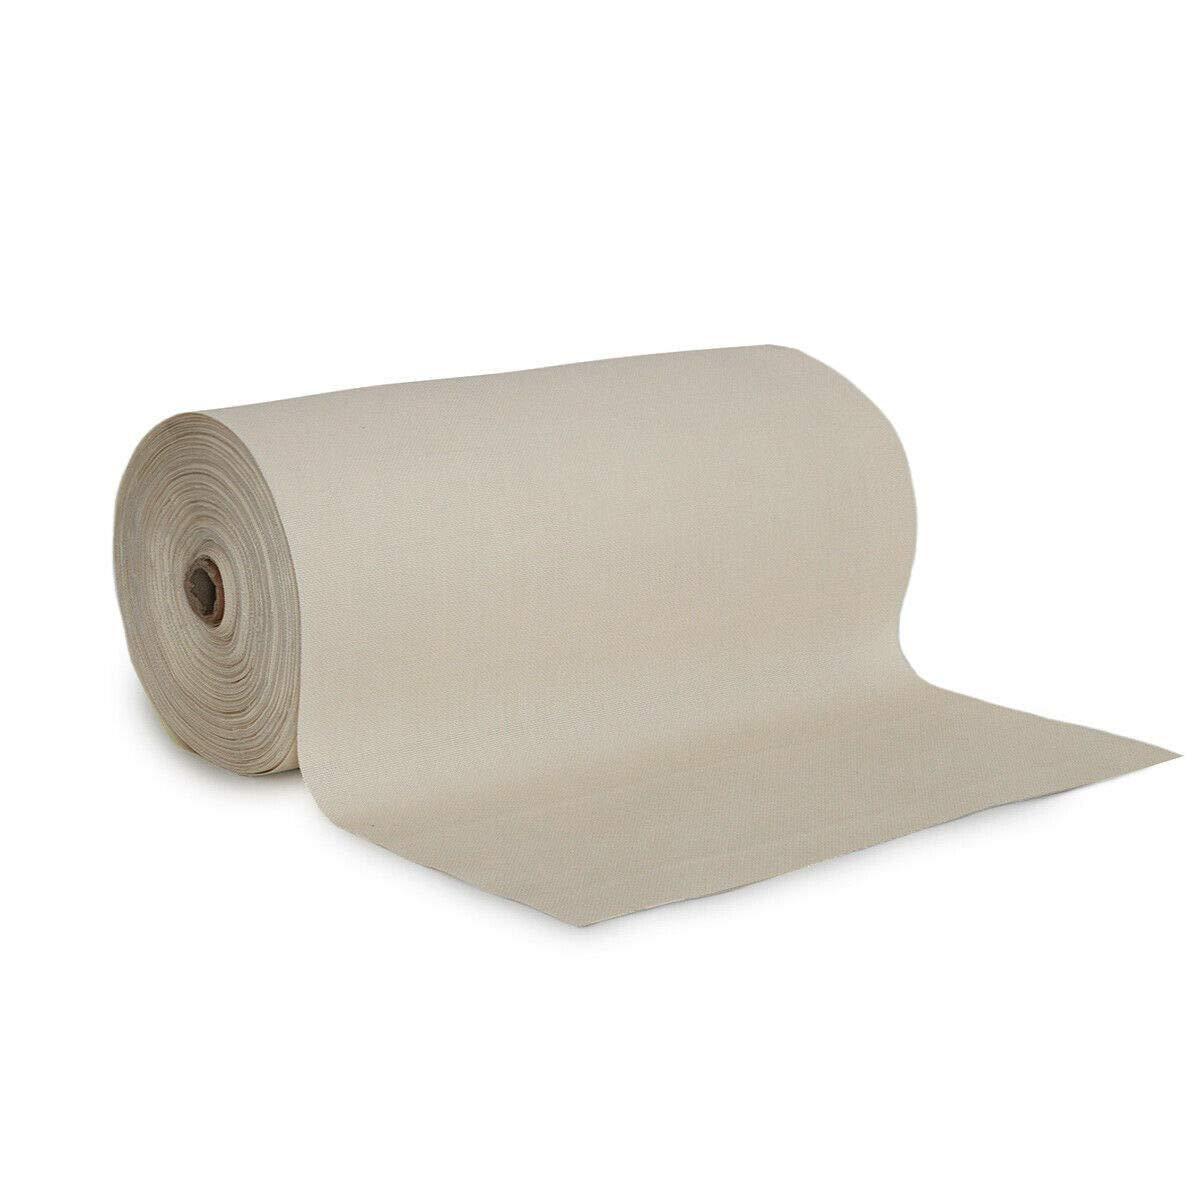 Tela in textilene per Sdraio e Lettino larghezze Varie S798 60 cm Beige